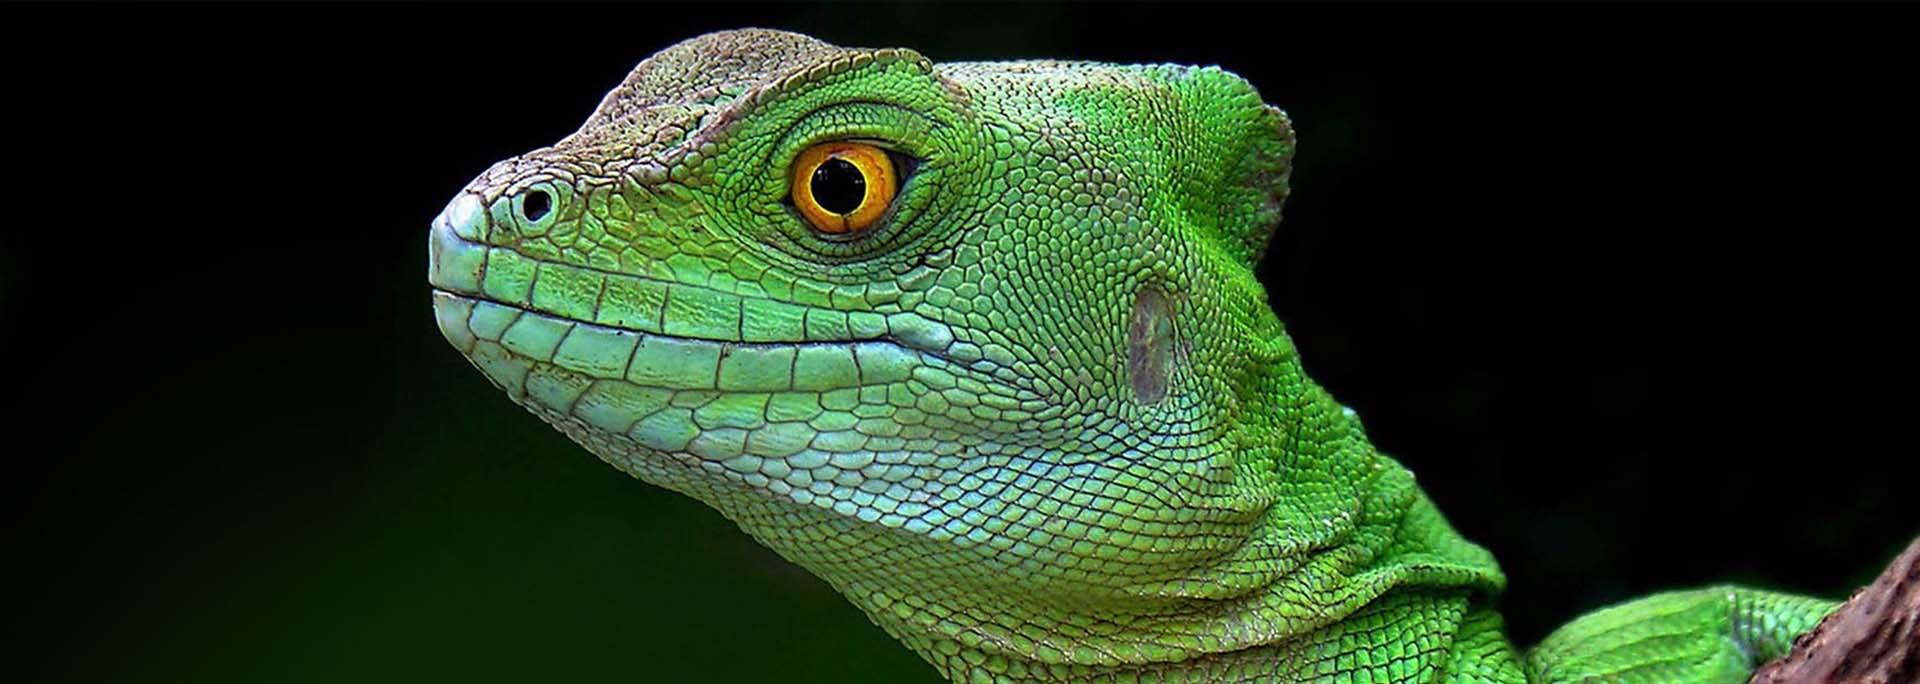 slider-reptiles-online-2